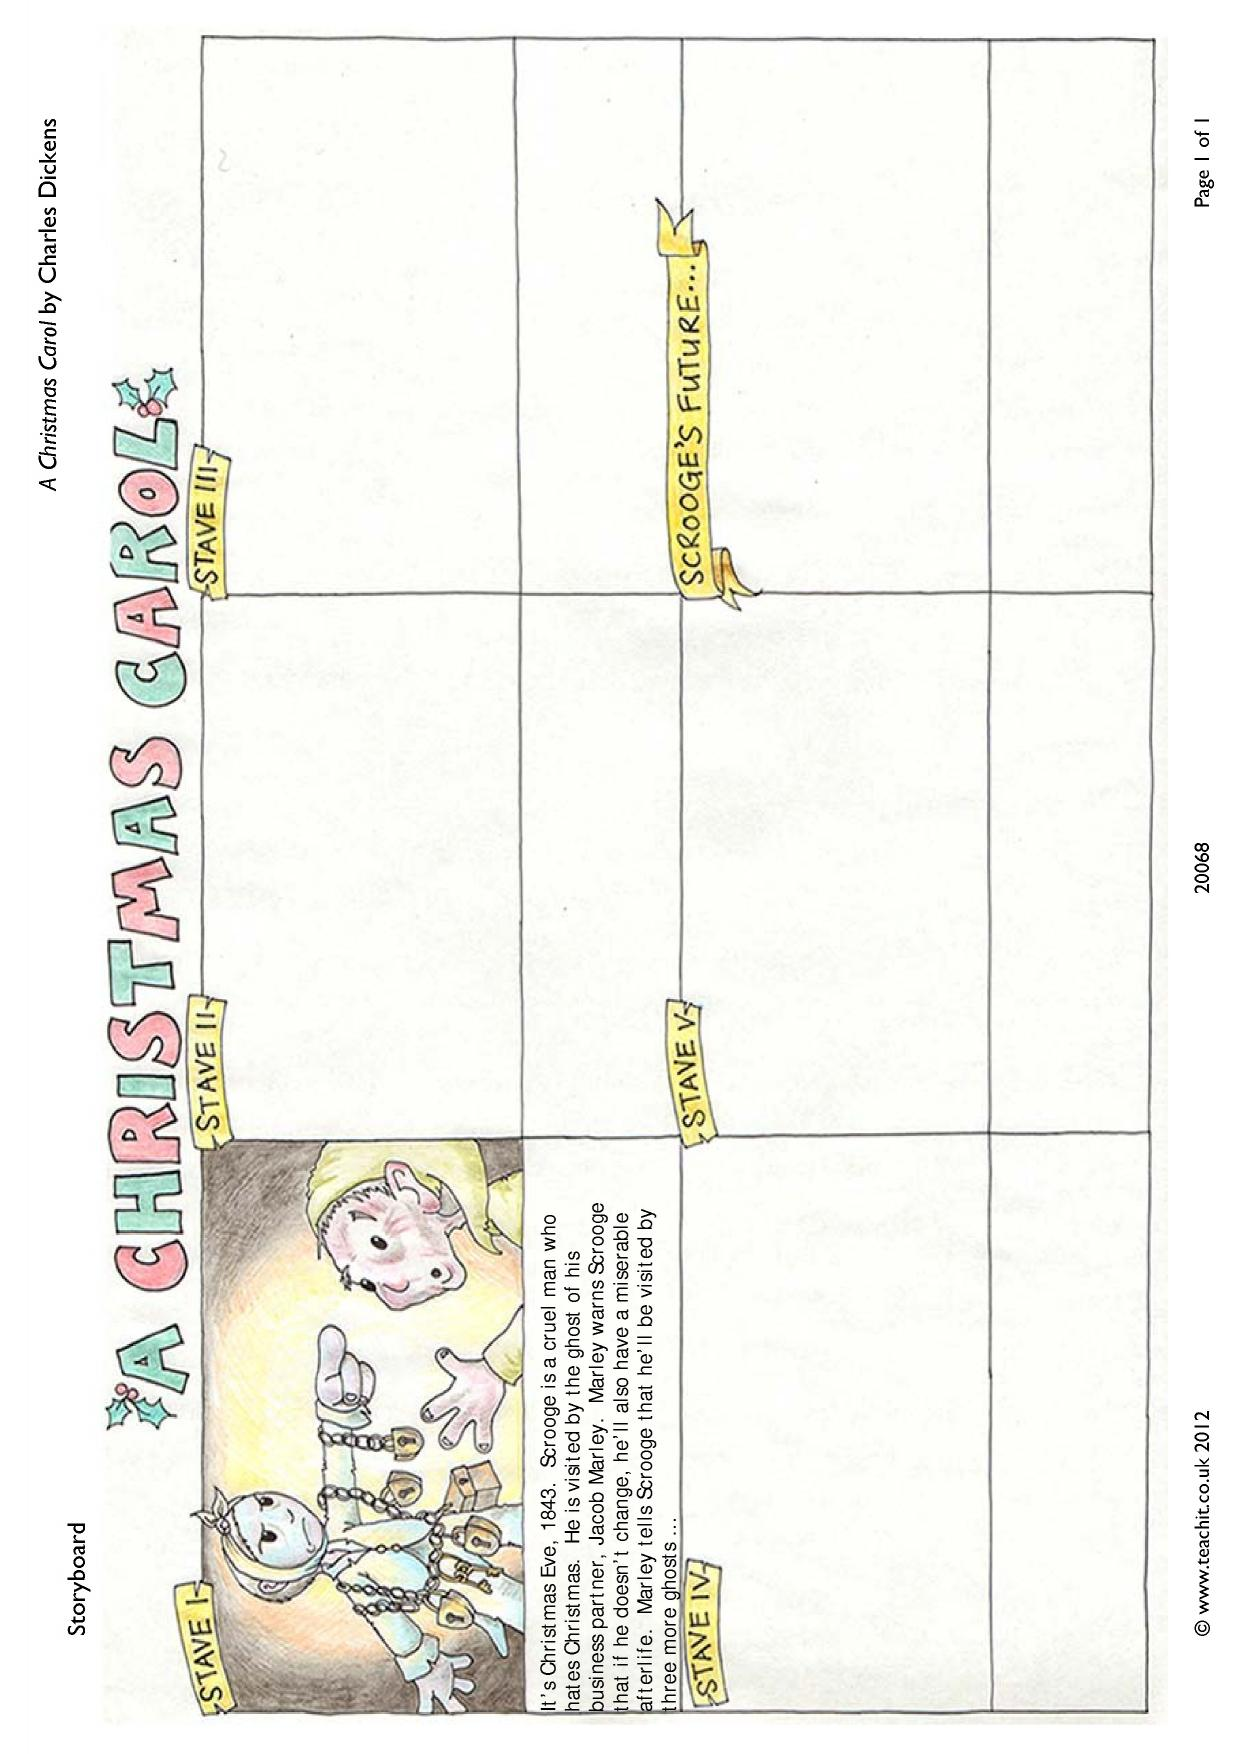 a christmas carol storyboard a christmas carol by charles a christmas carol storyboard a christmas carol by charles dickens home page